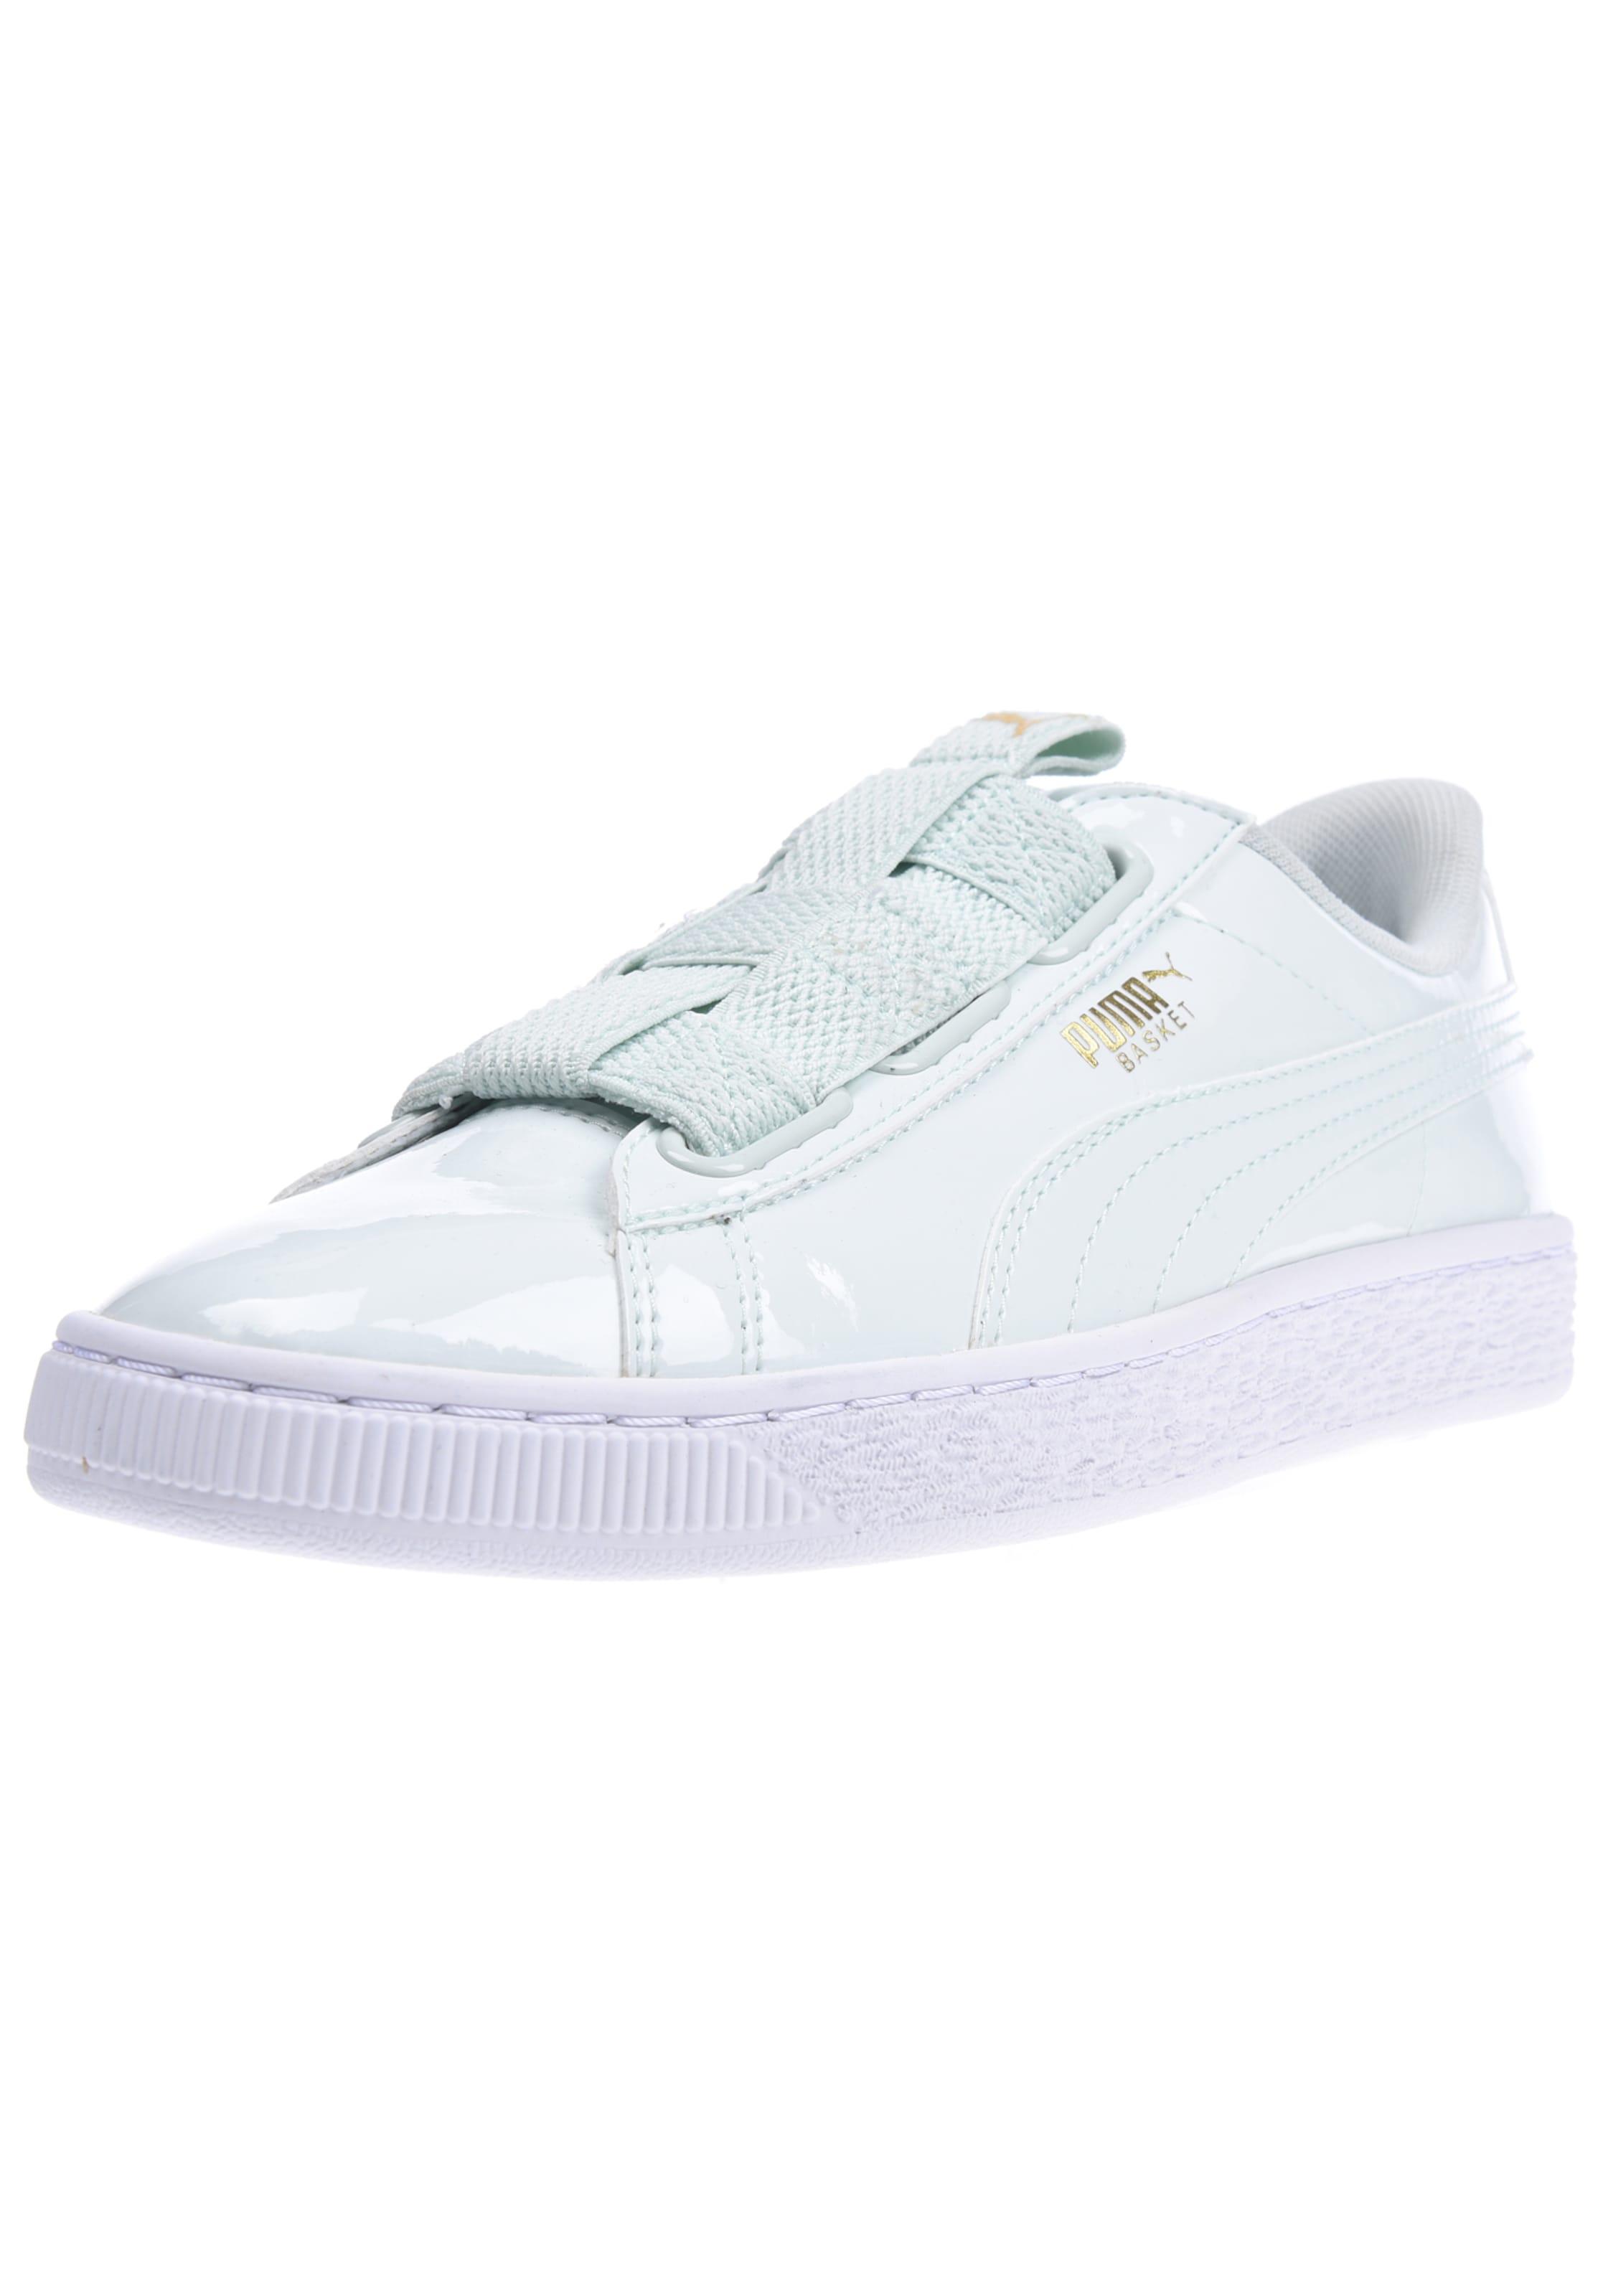 PUMA  Basket Maze  Sneaker